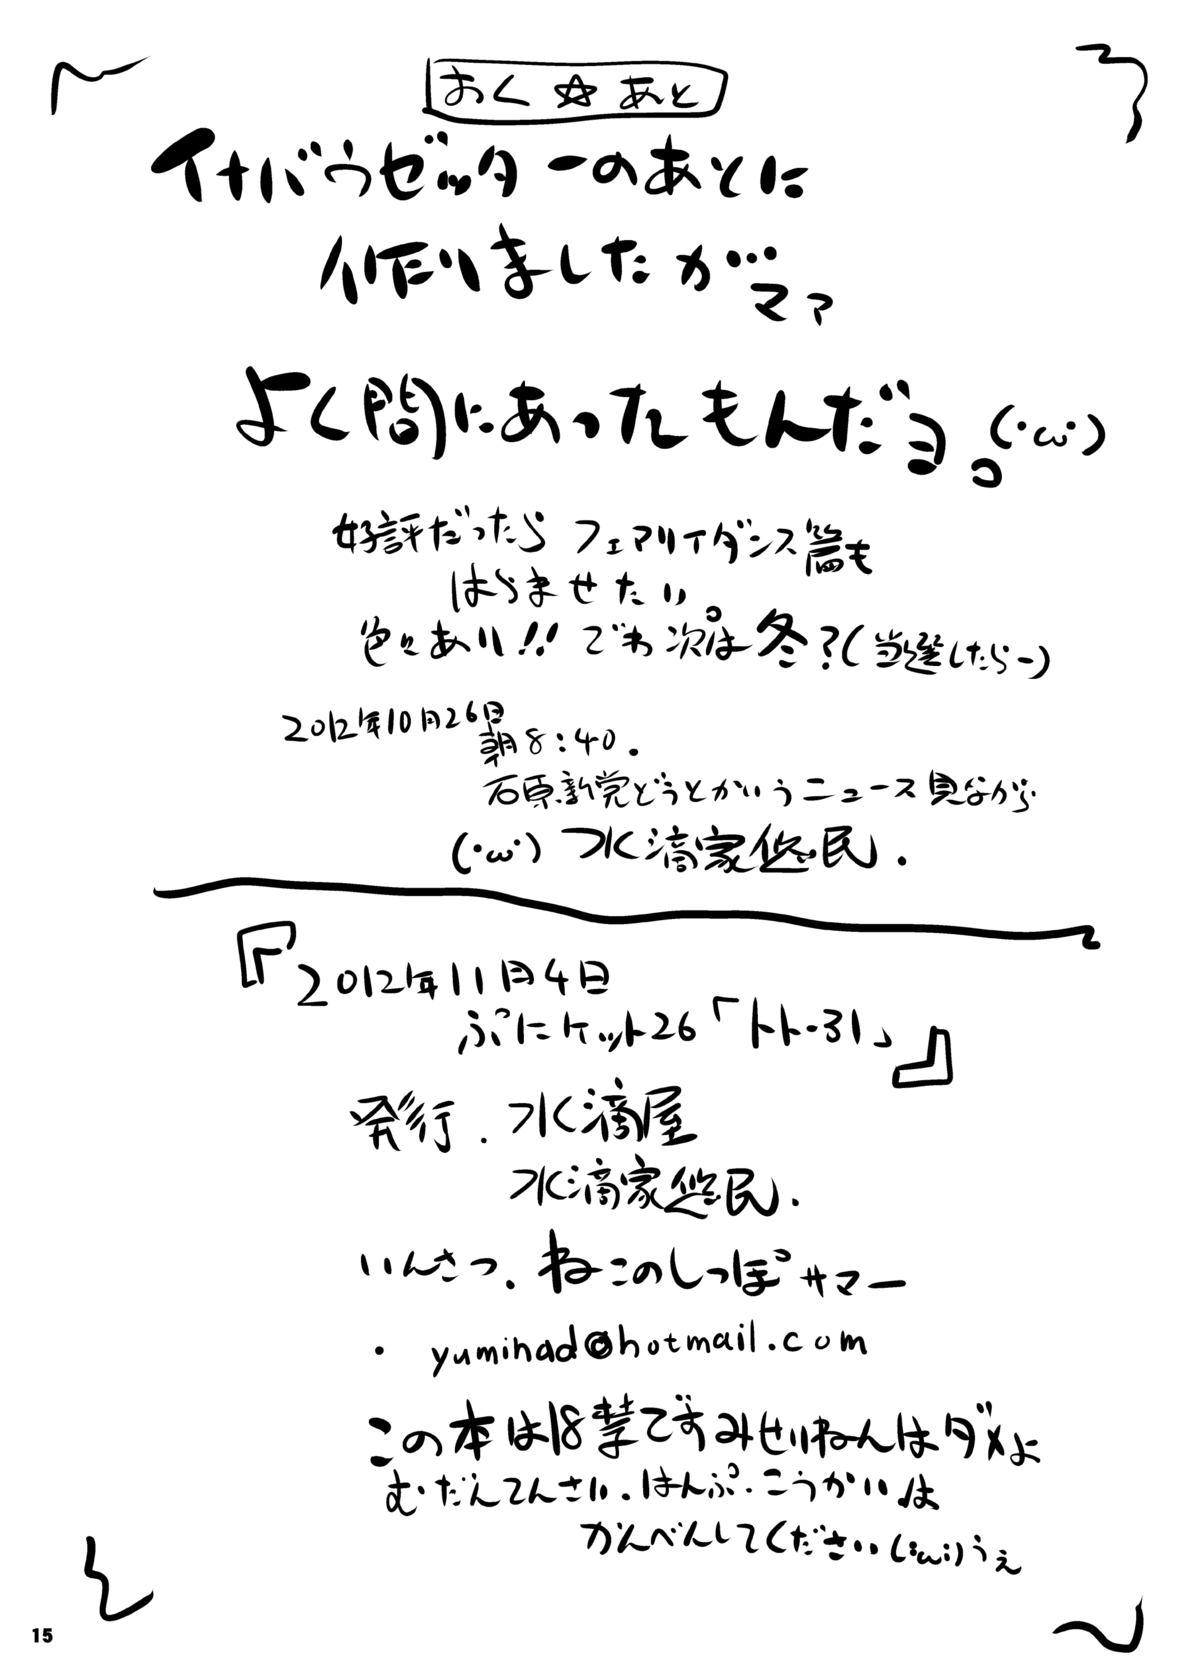 [Suitekiya (Suiteki-ka Yū-min)]Kennai Mating Scandal (1: Einclad / 2: Fairy Dance) SAO The Complete (Sword Art Online) 14